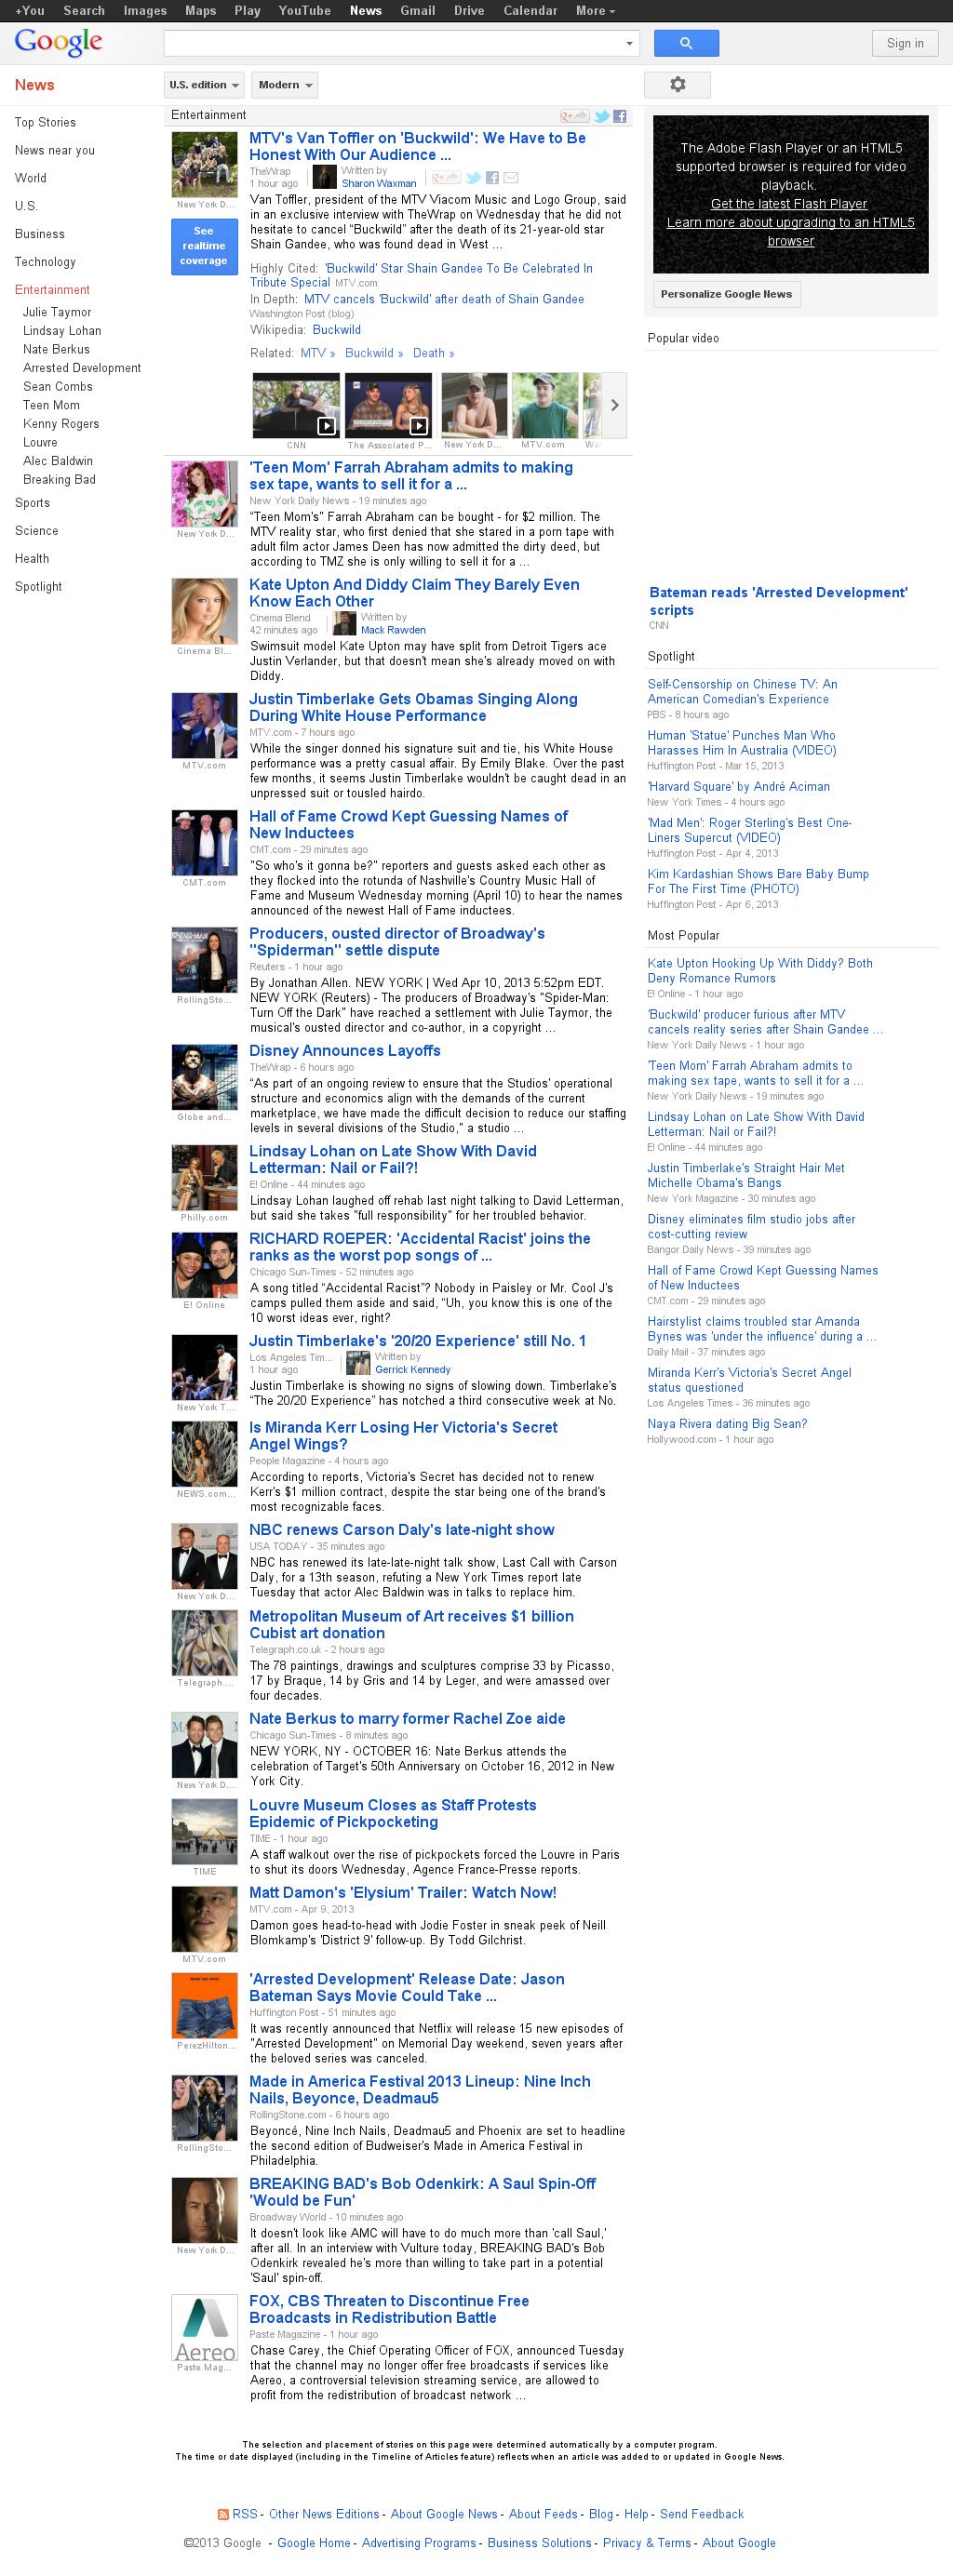 Google News: Entertainment at Wednesday April 10, 2013, 11:09 p.m. UTC